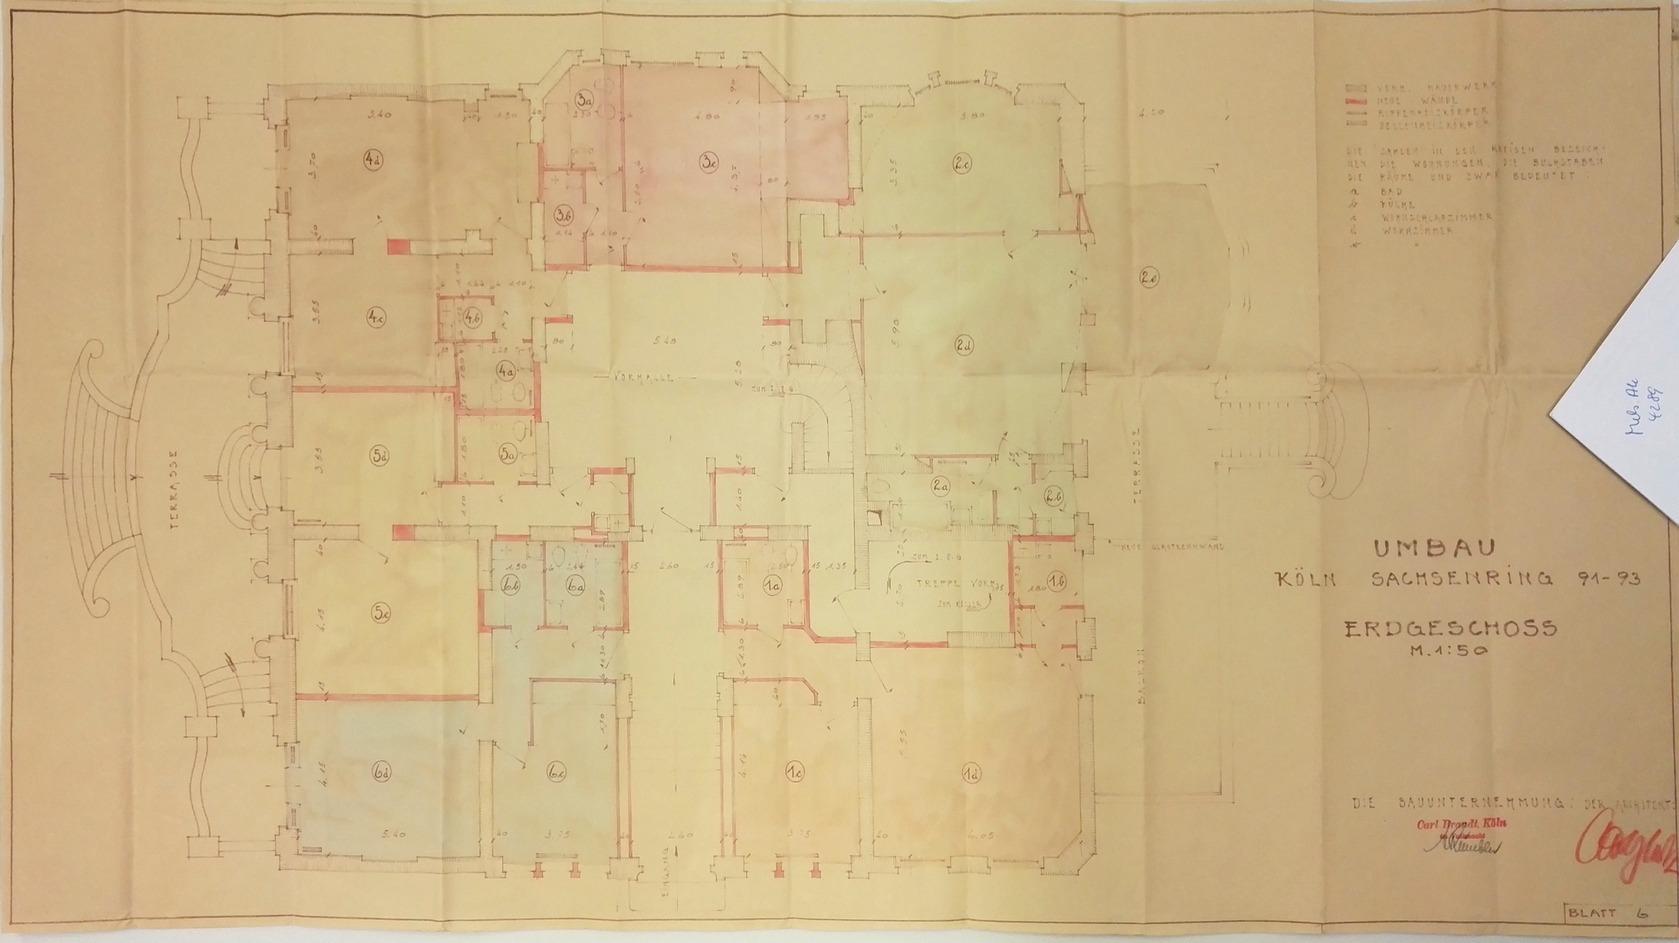 Mels.Ak, Nr. 4289: Plan des EG Sachsenring 91-93, Köln